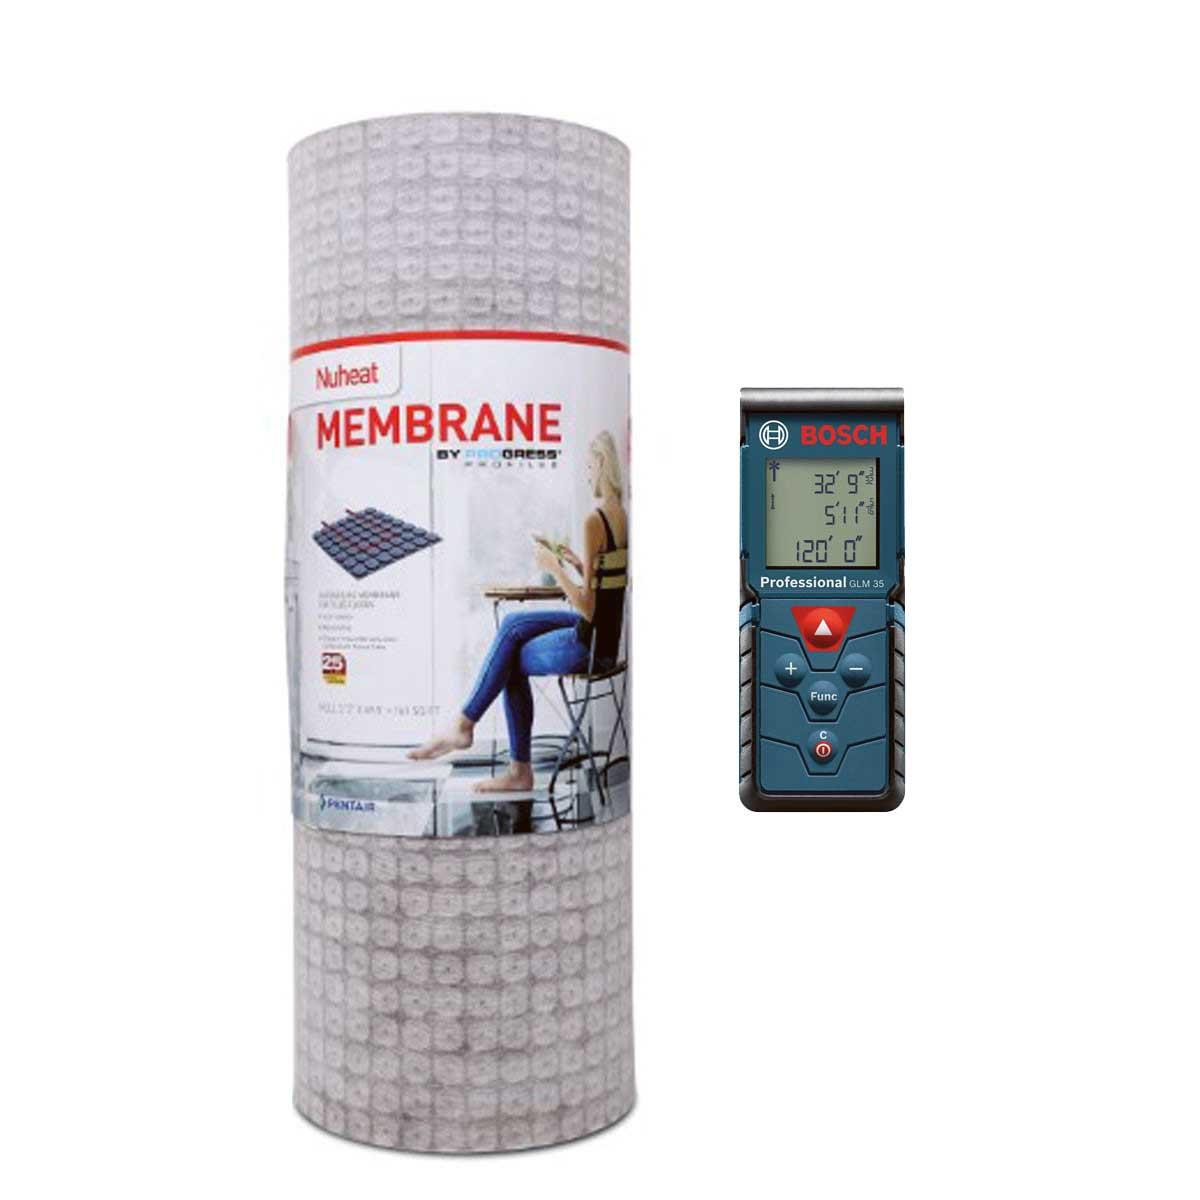 nuheat membrane, bosch glm35